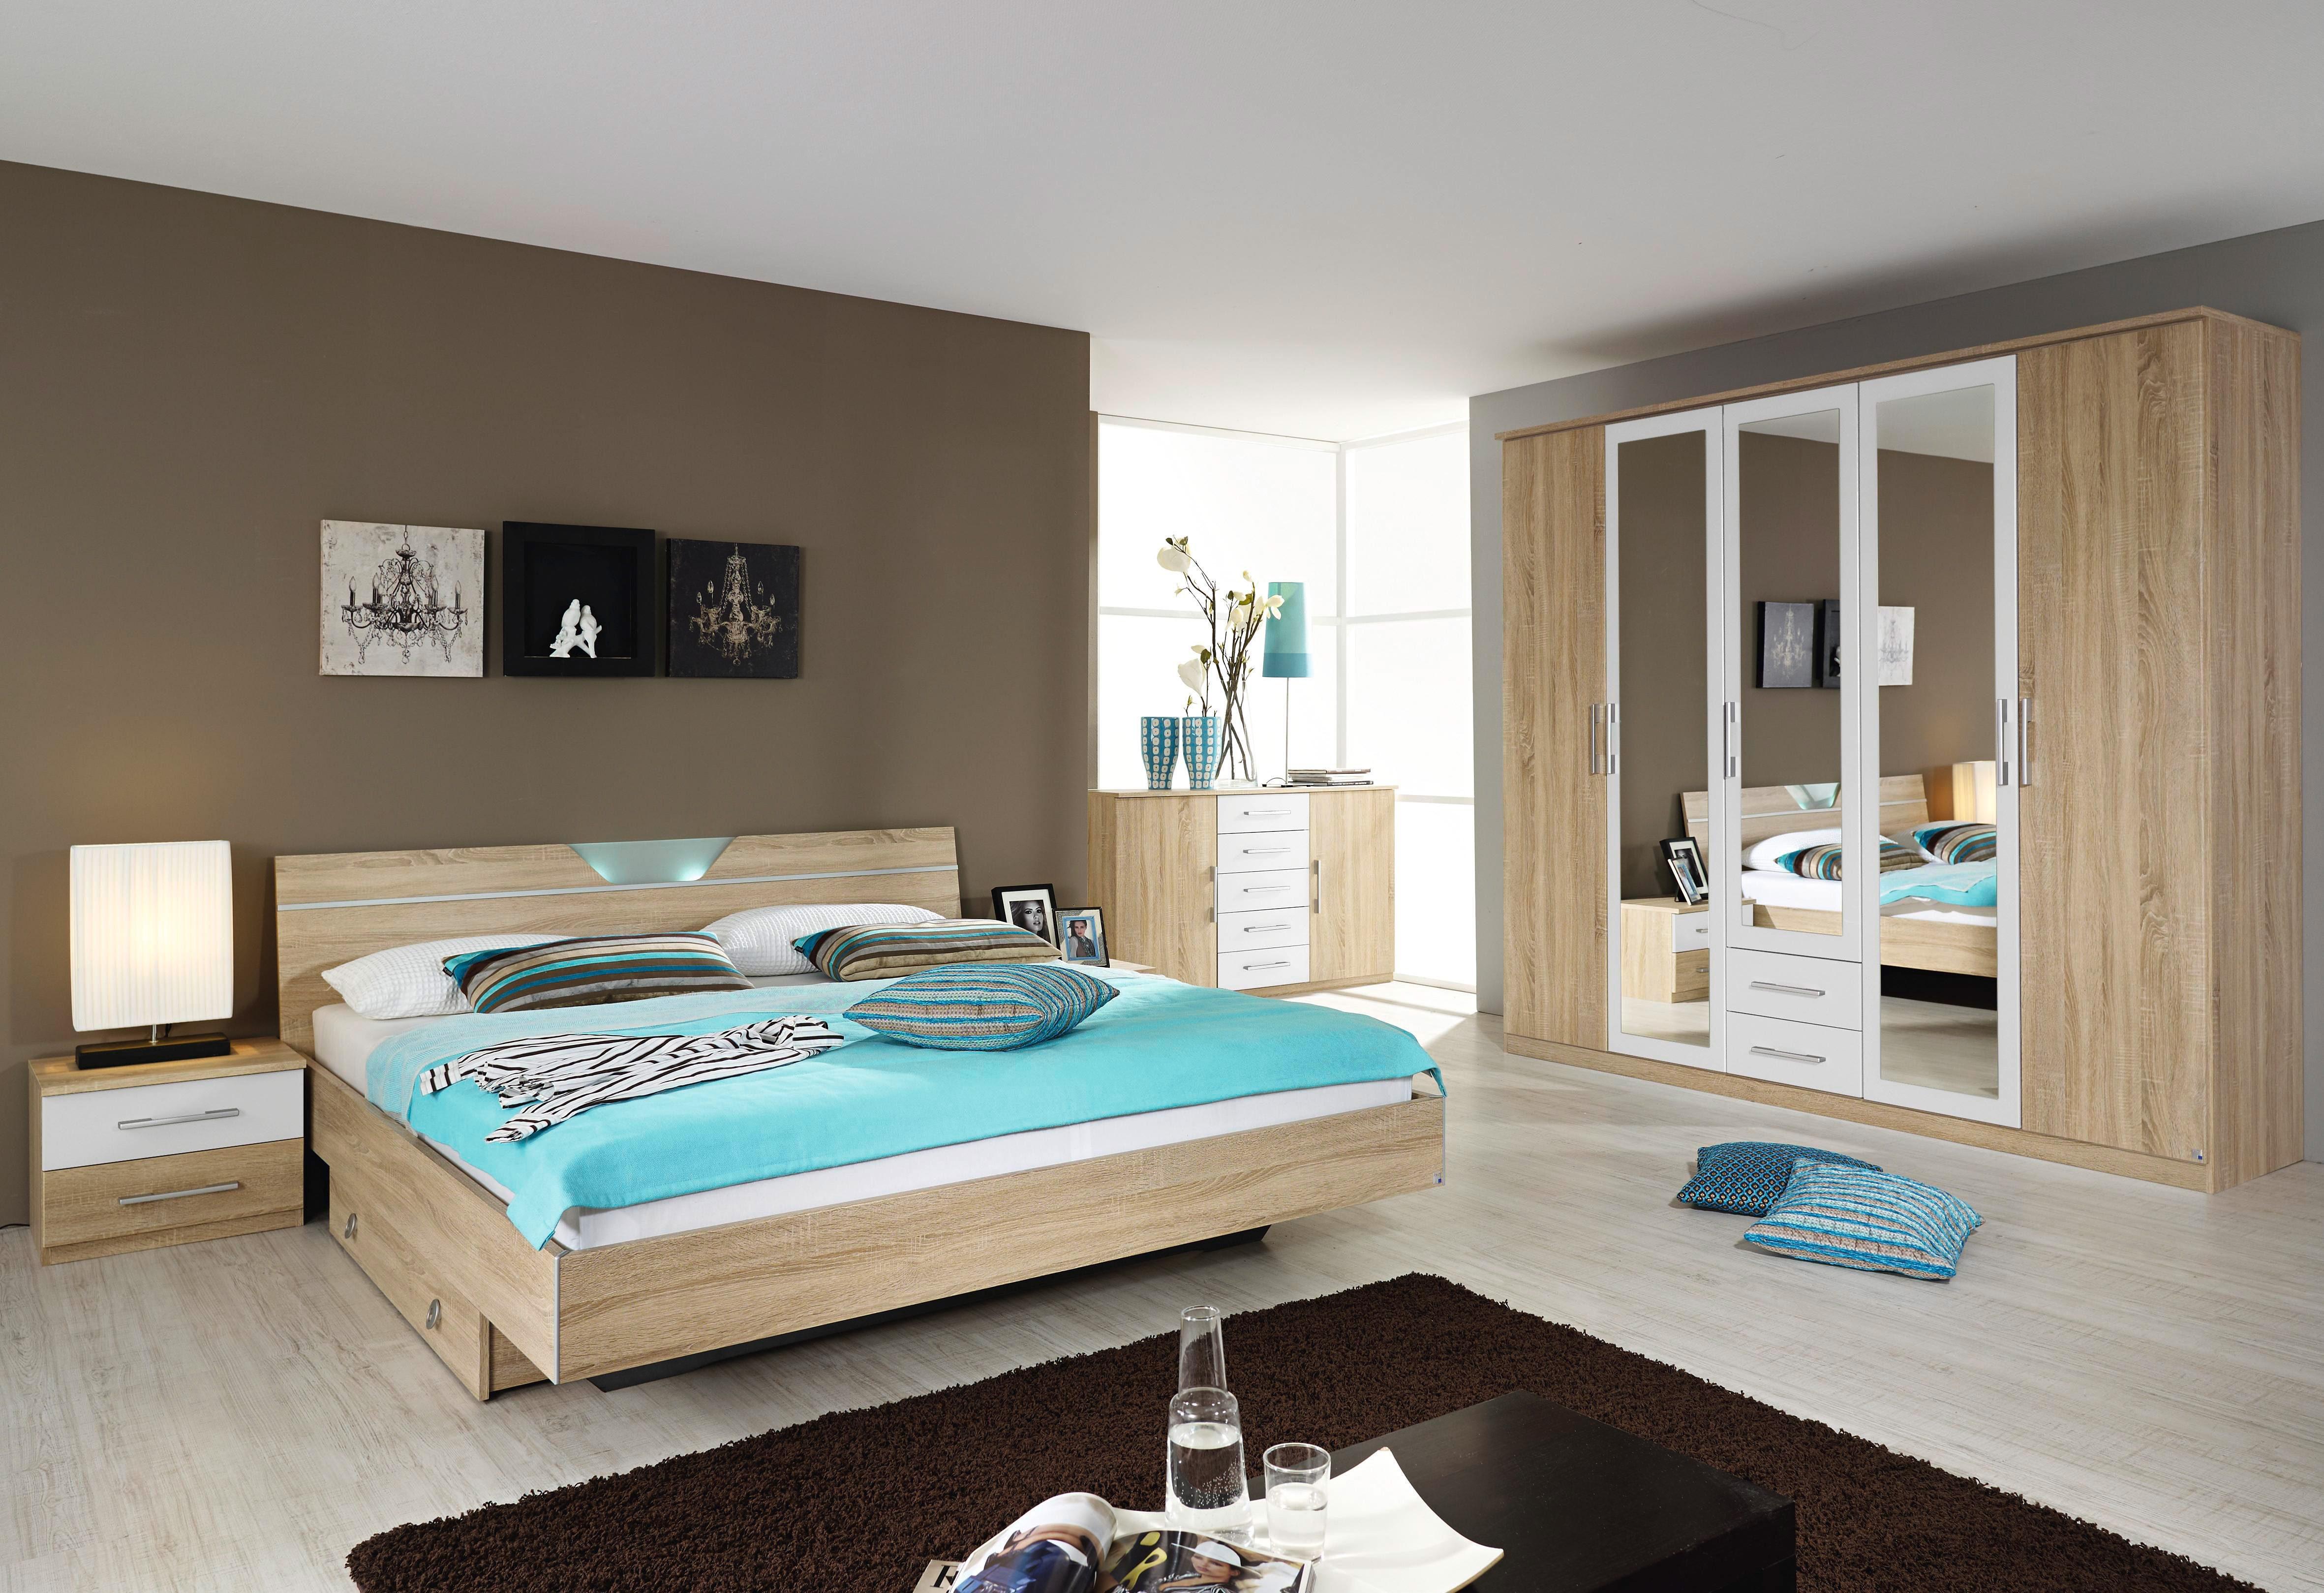 rauch Schlafzimmer-Set Valence (Set 4-tlg)